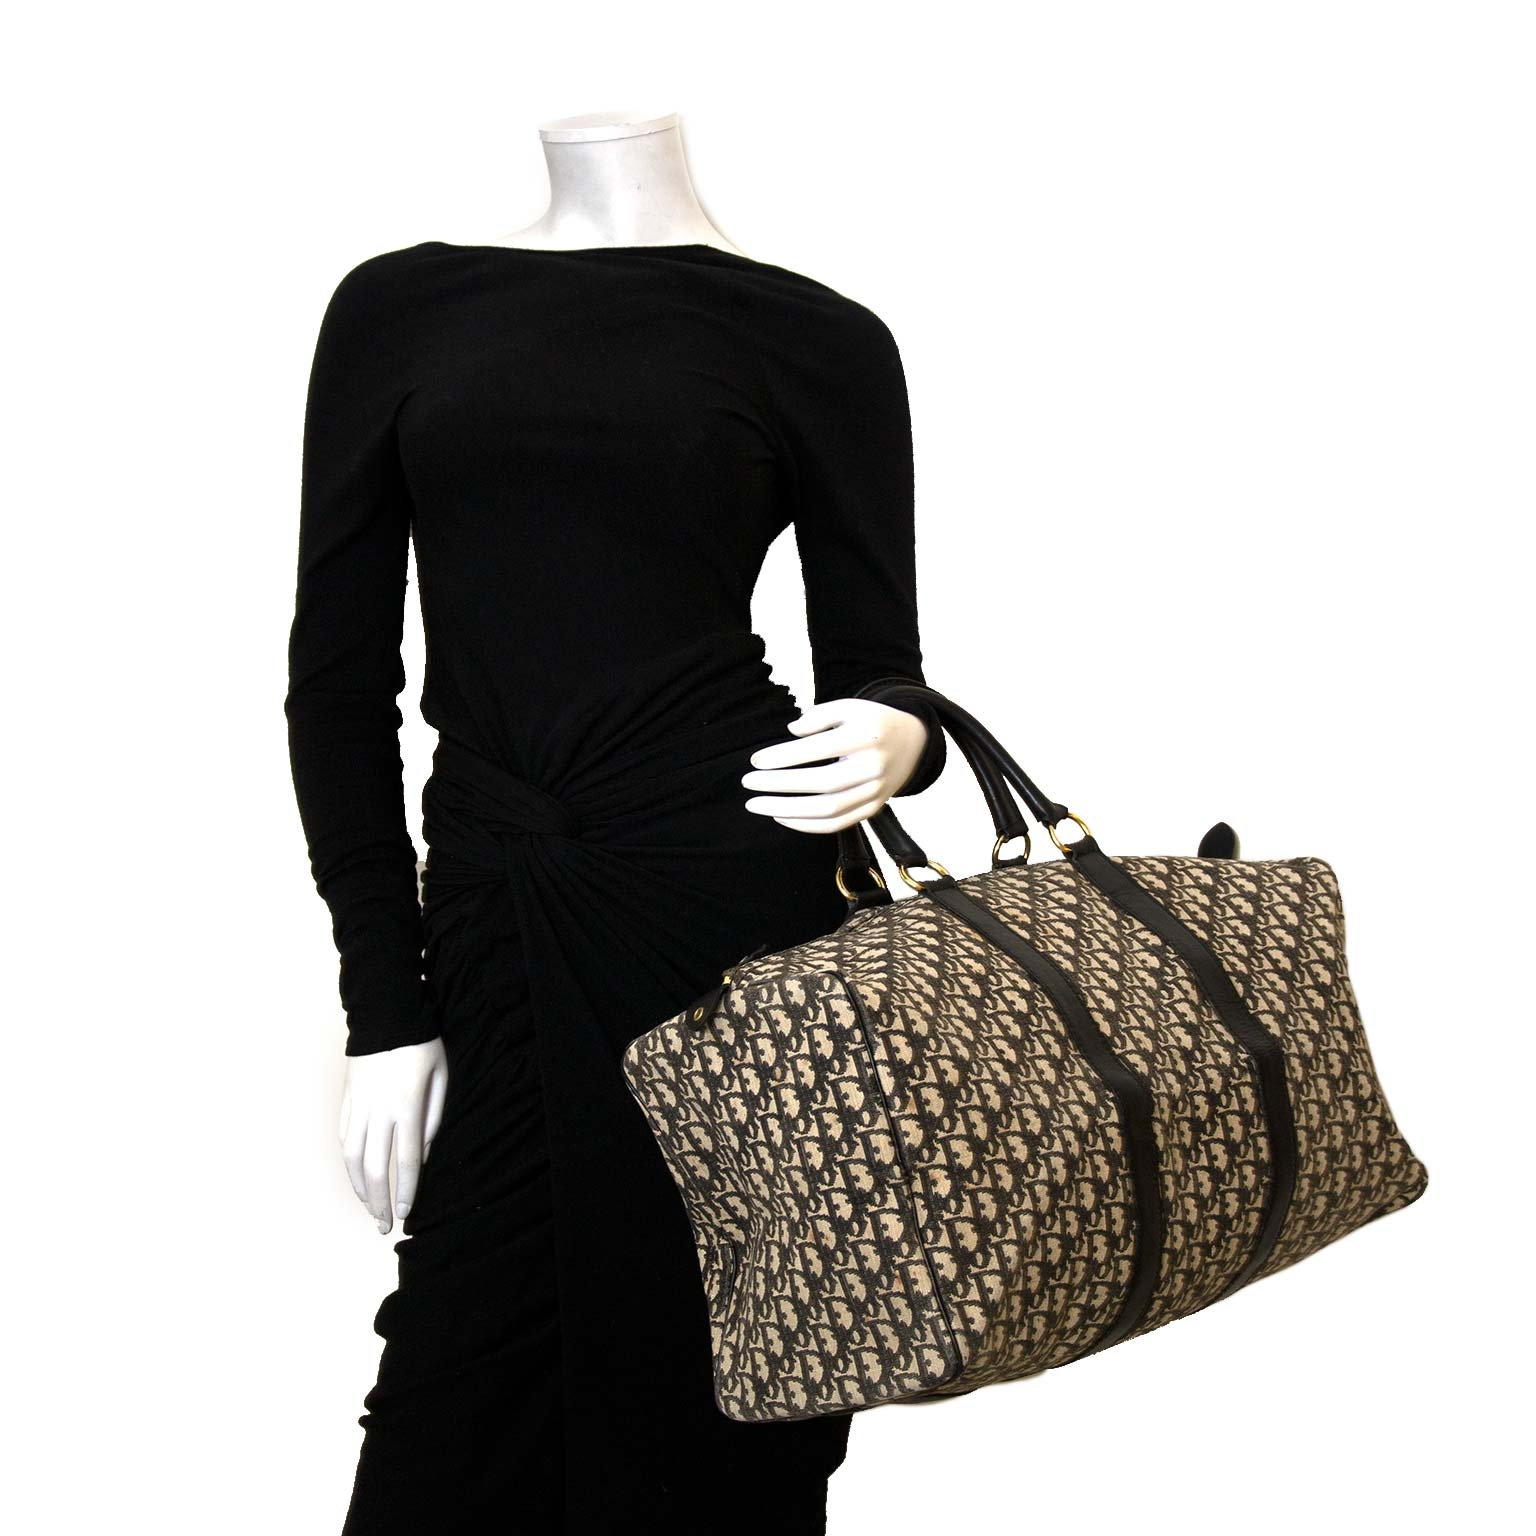 cc87dadf5d Buy authentic Dior duffle bags now online at Labellov vintage webshop Koop  authentieke Dior plunjezak nu online bij Labellov vintage webshop